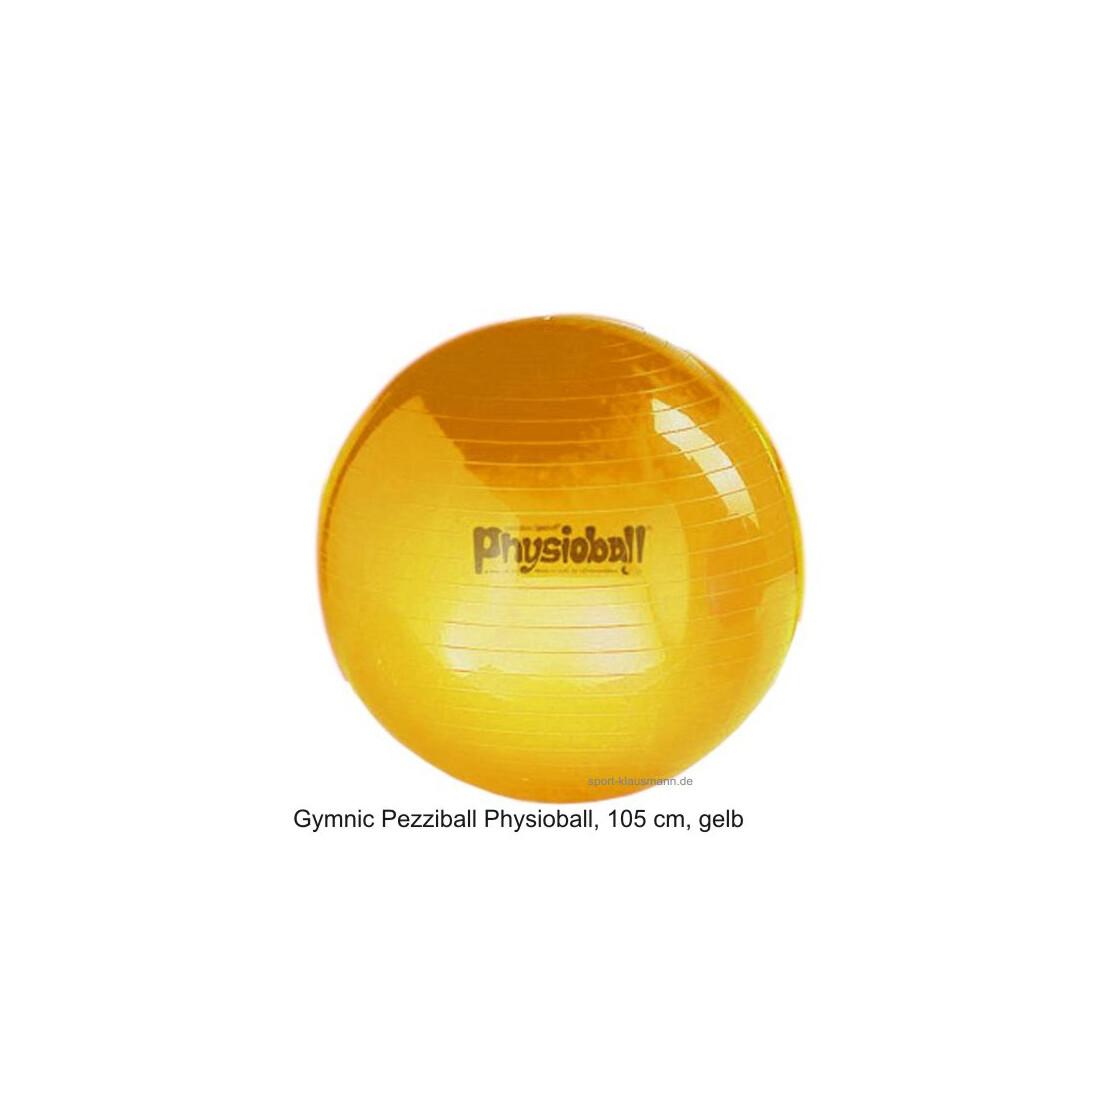 pezzi gymnastikball physioball sitzball 105 cm gelb outdoor au. Black Bedroom Furniture Sets. Home Design Ideas